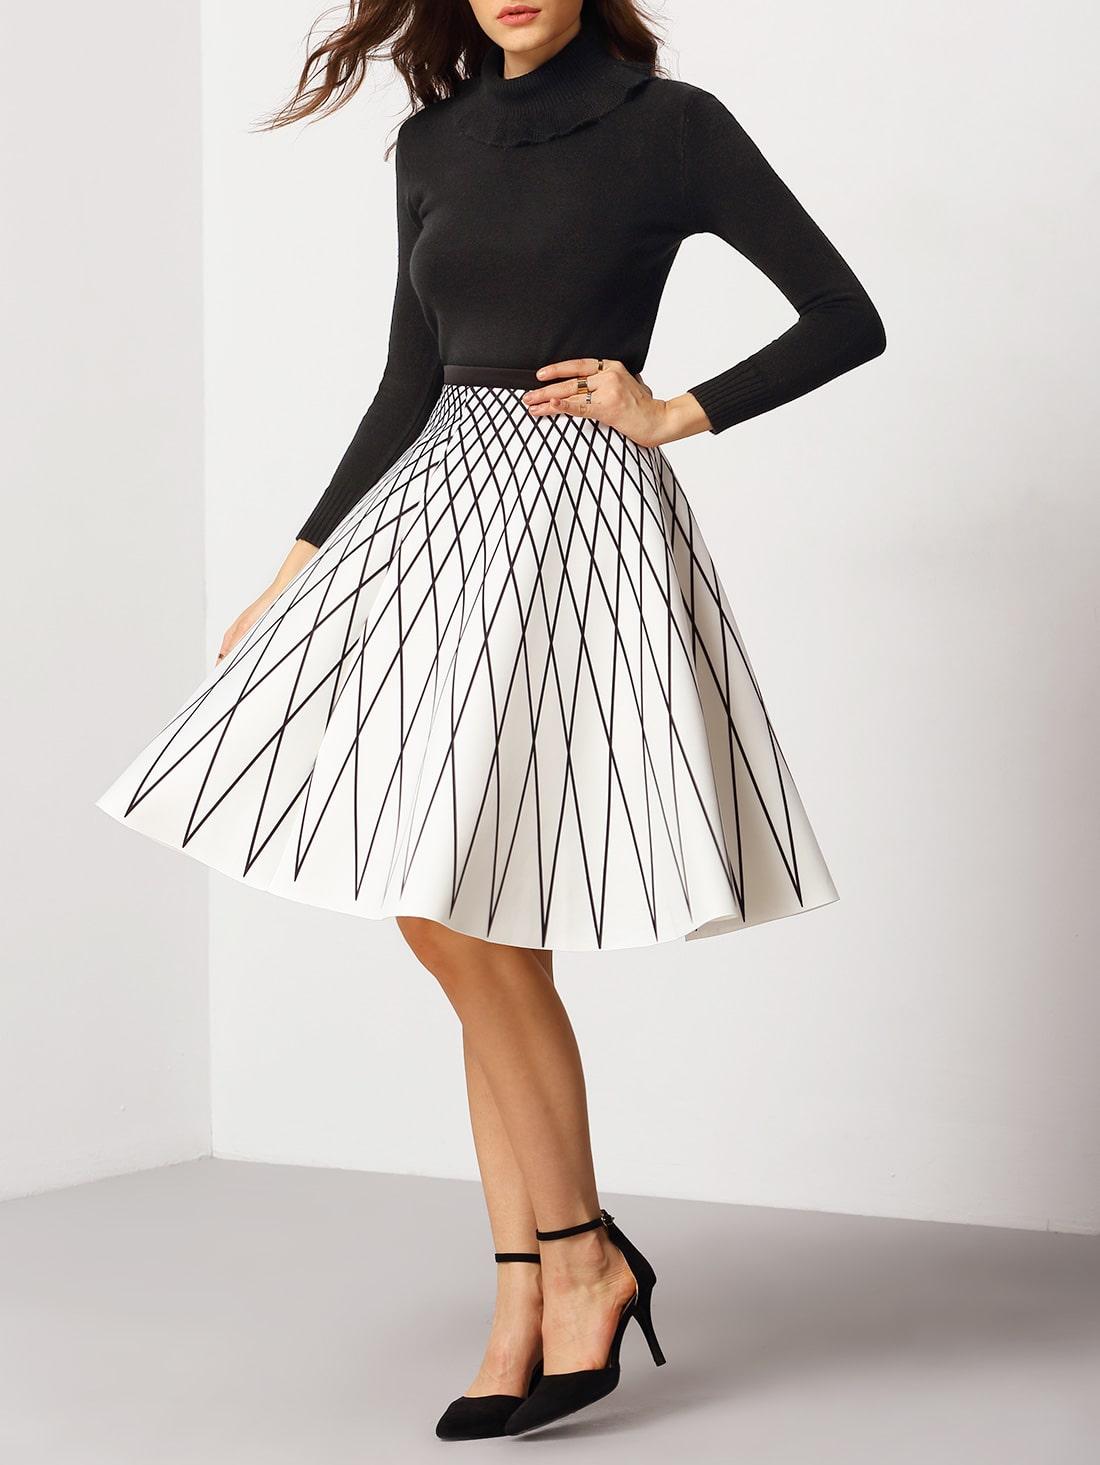 White High Waist Geometric Print Flare Skirt